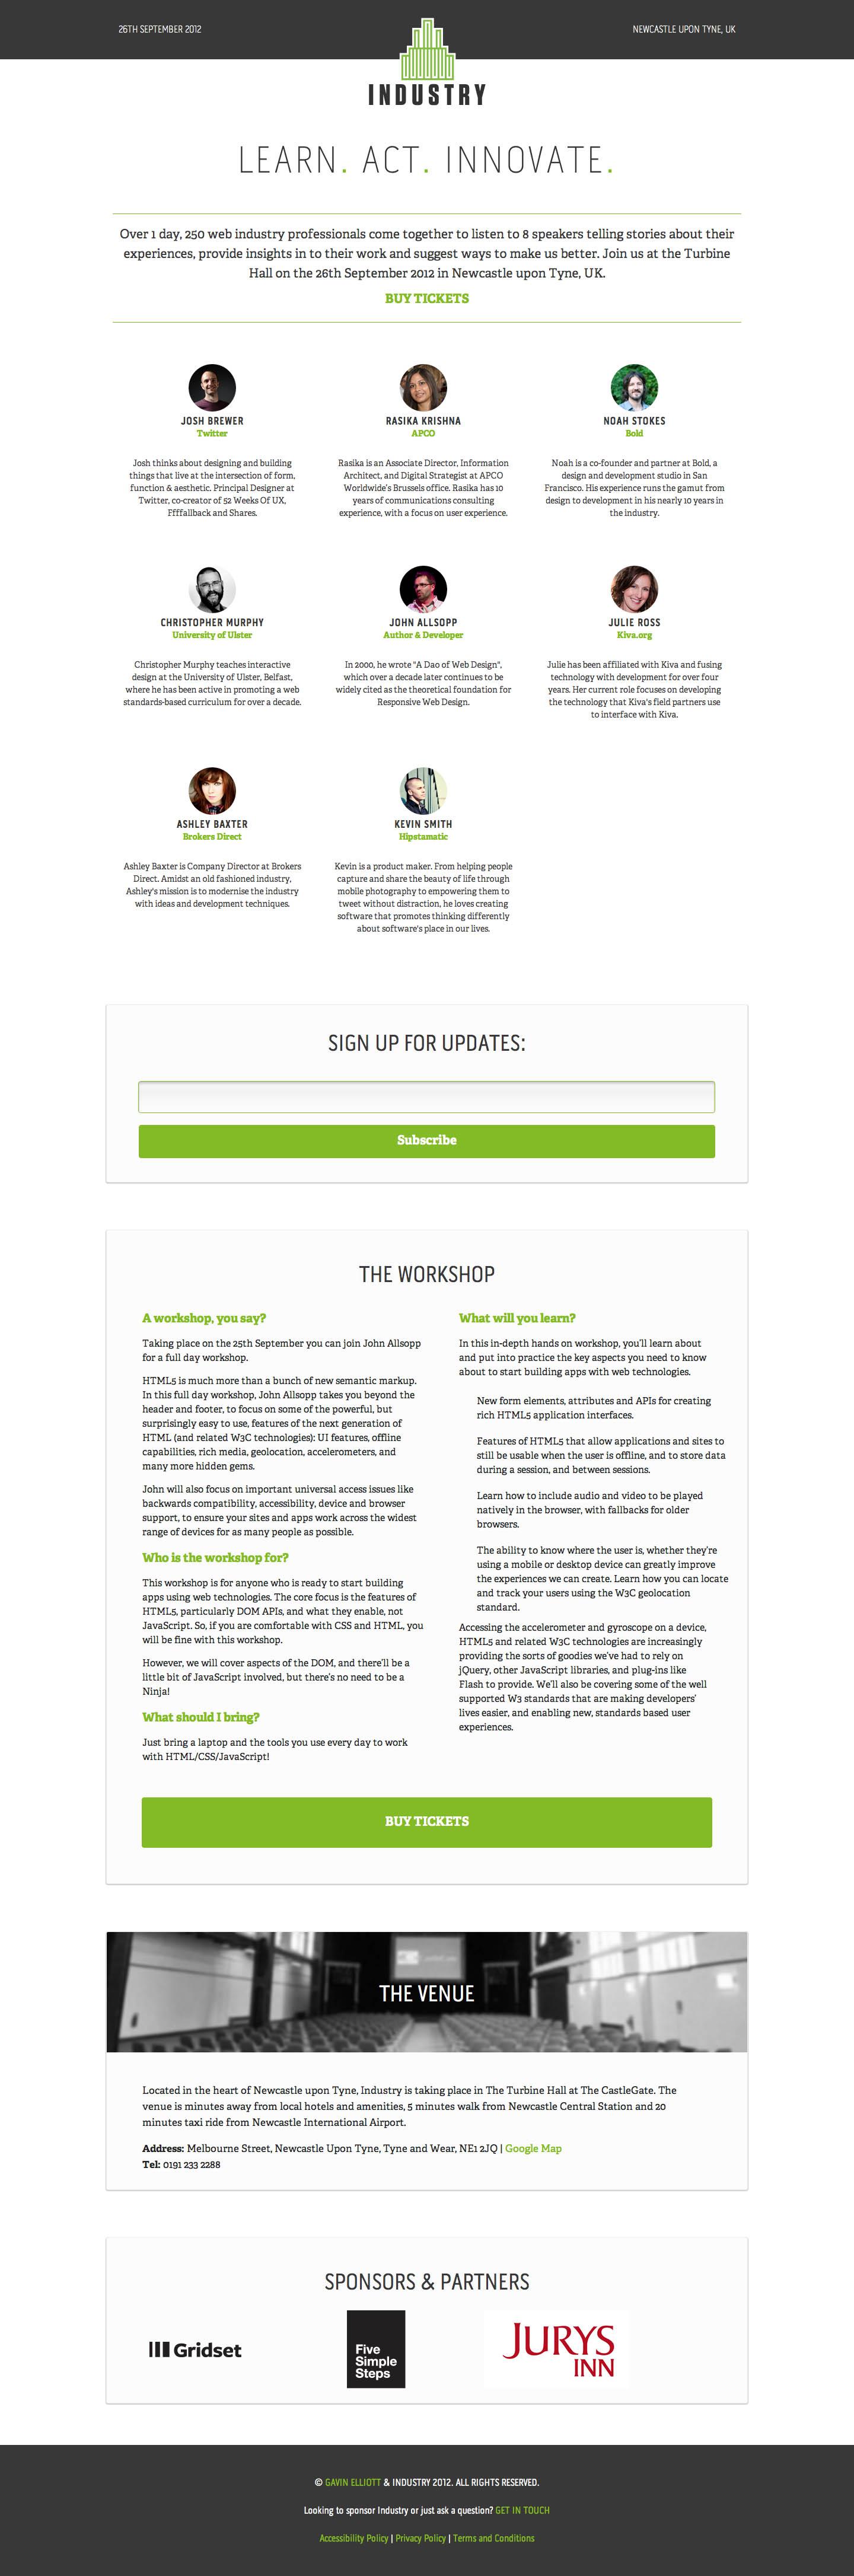 Industry Conference Website Screenshot